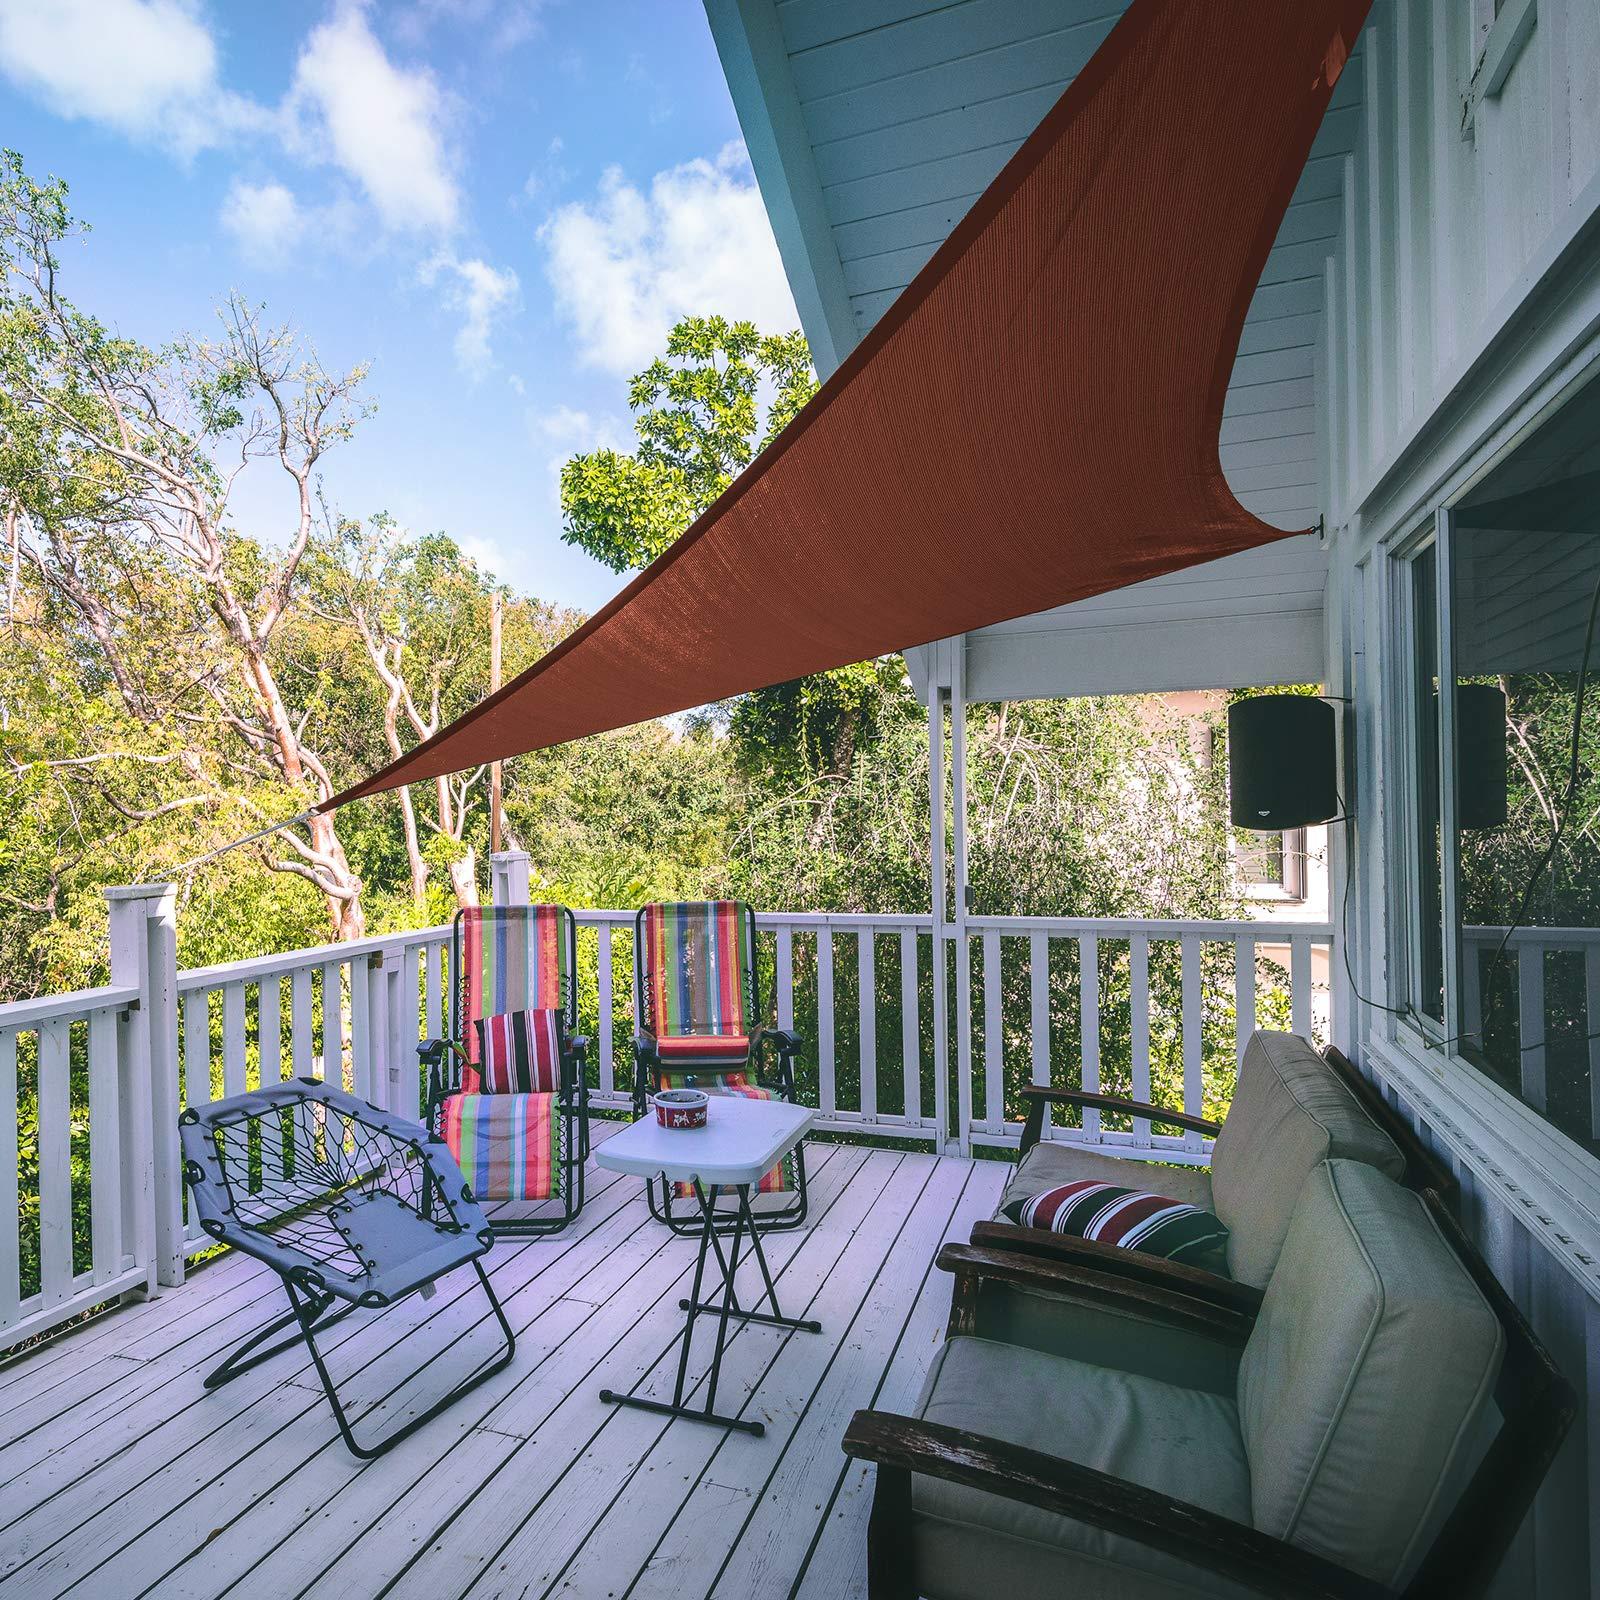 BB Sport Toldo Vela 3m x 3m x 4.24m Terracota Triangular HDPE Vela Sombra Protección Rayos UV 90% Transpirable: Amazon.es: Jardín